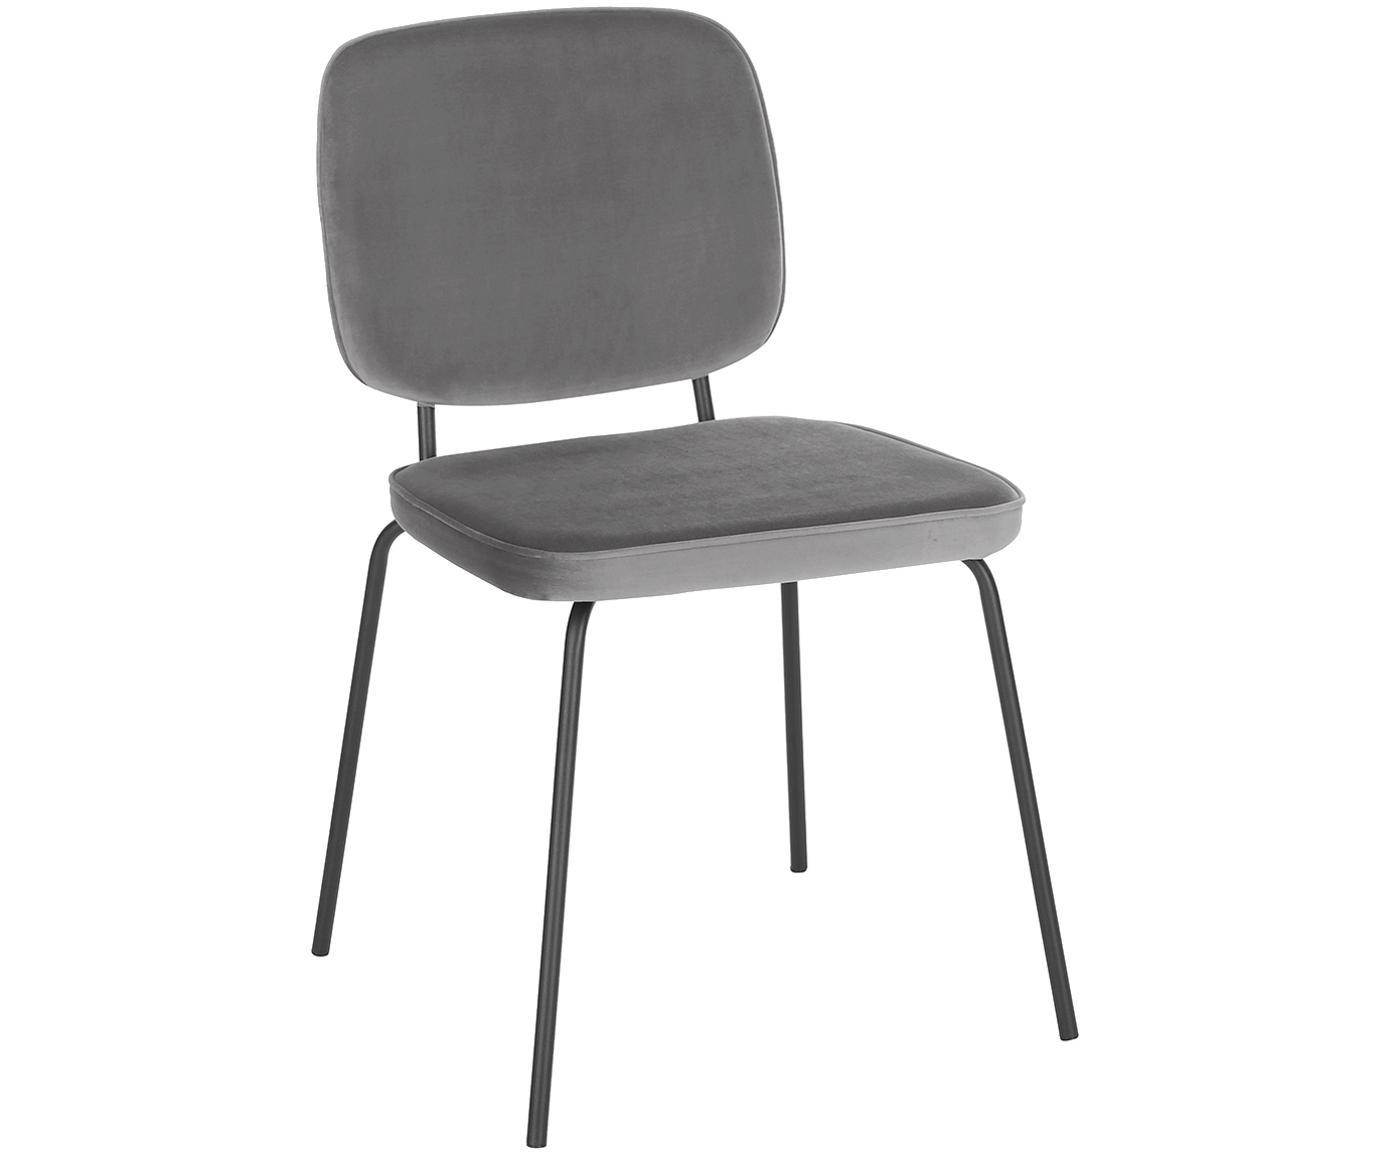 Sedia imbottita in velluto Jasper 2 pz, Rivestimento: velluto (copertura in pol, Gambe: metallo verniciato a polv, Grigio, Larg. 49 x Prof. 57 cm